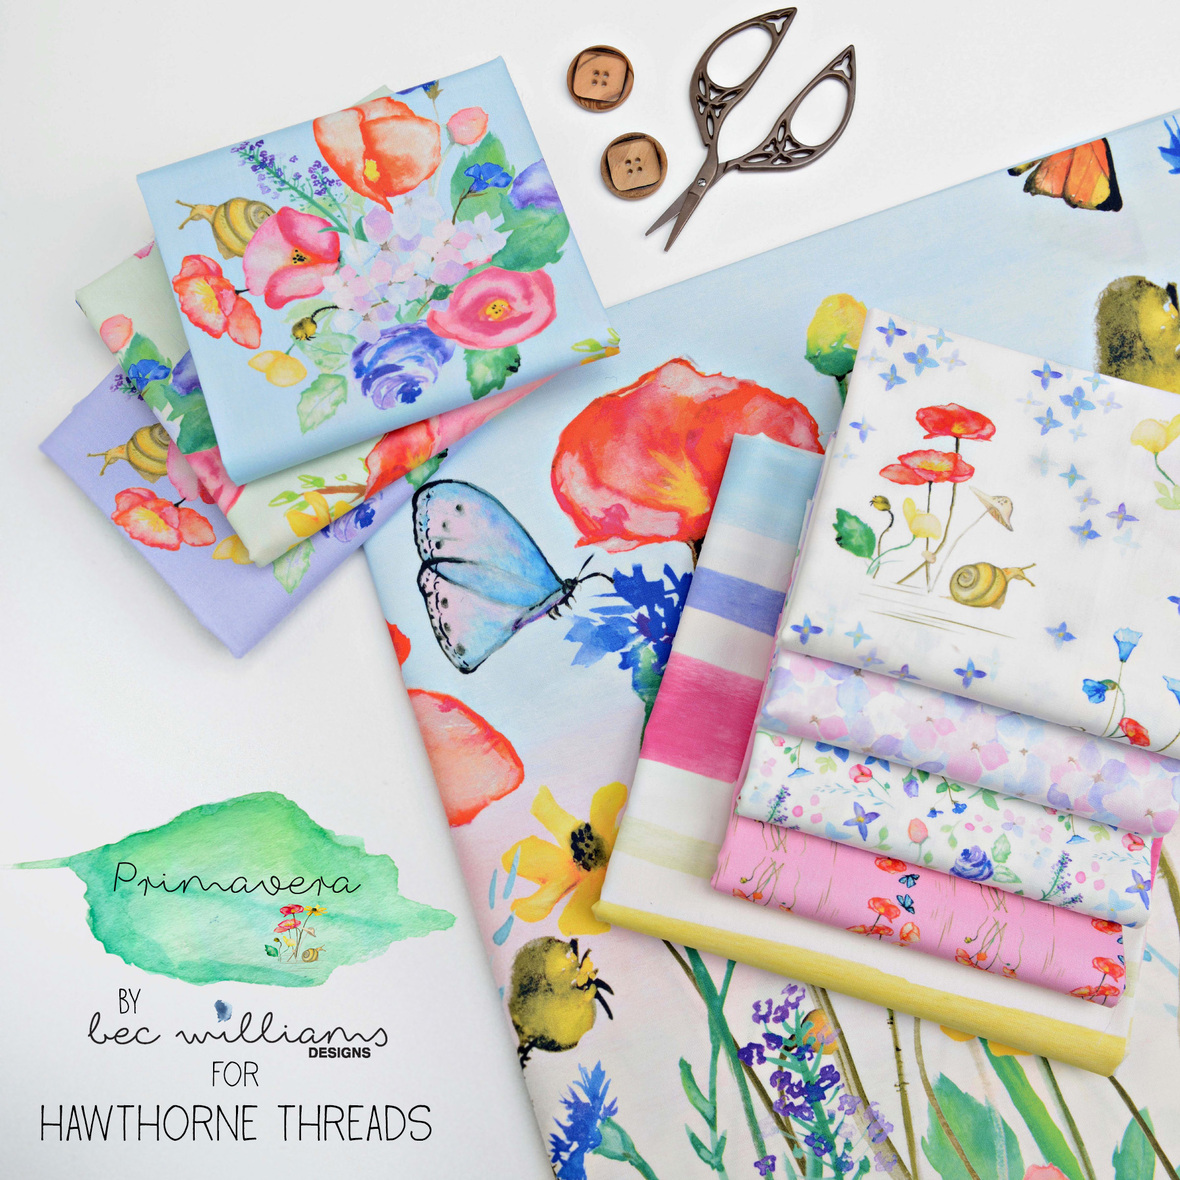 Bec Williams Primavera Fabric for Hawthorne Threads with logo